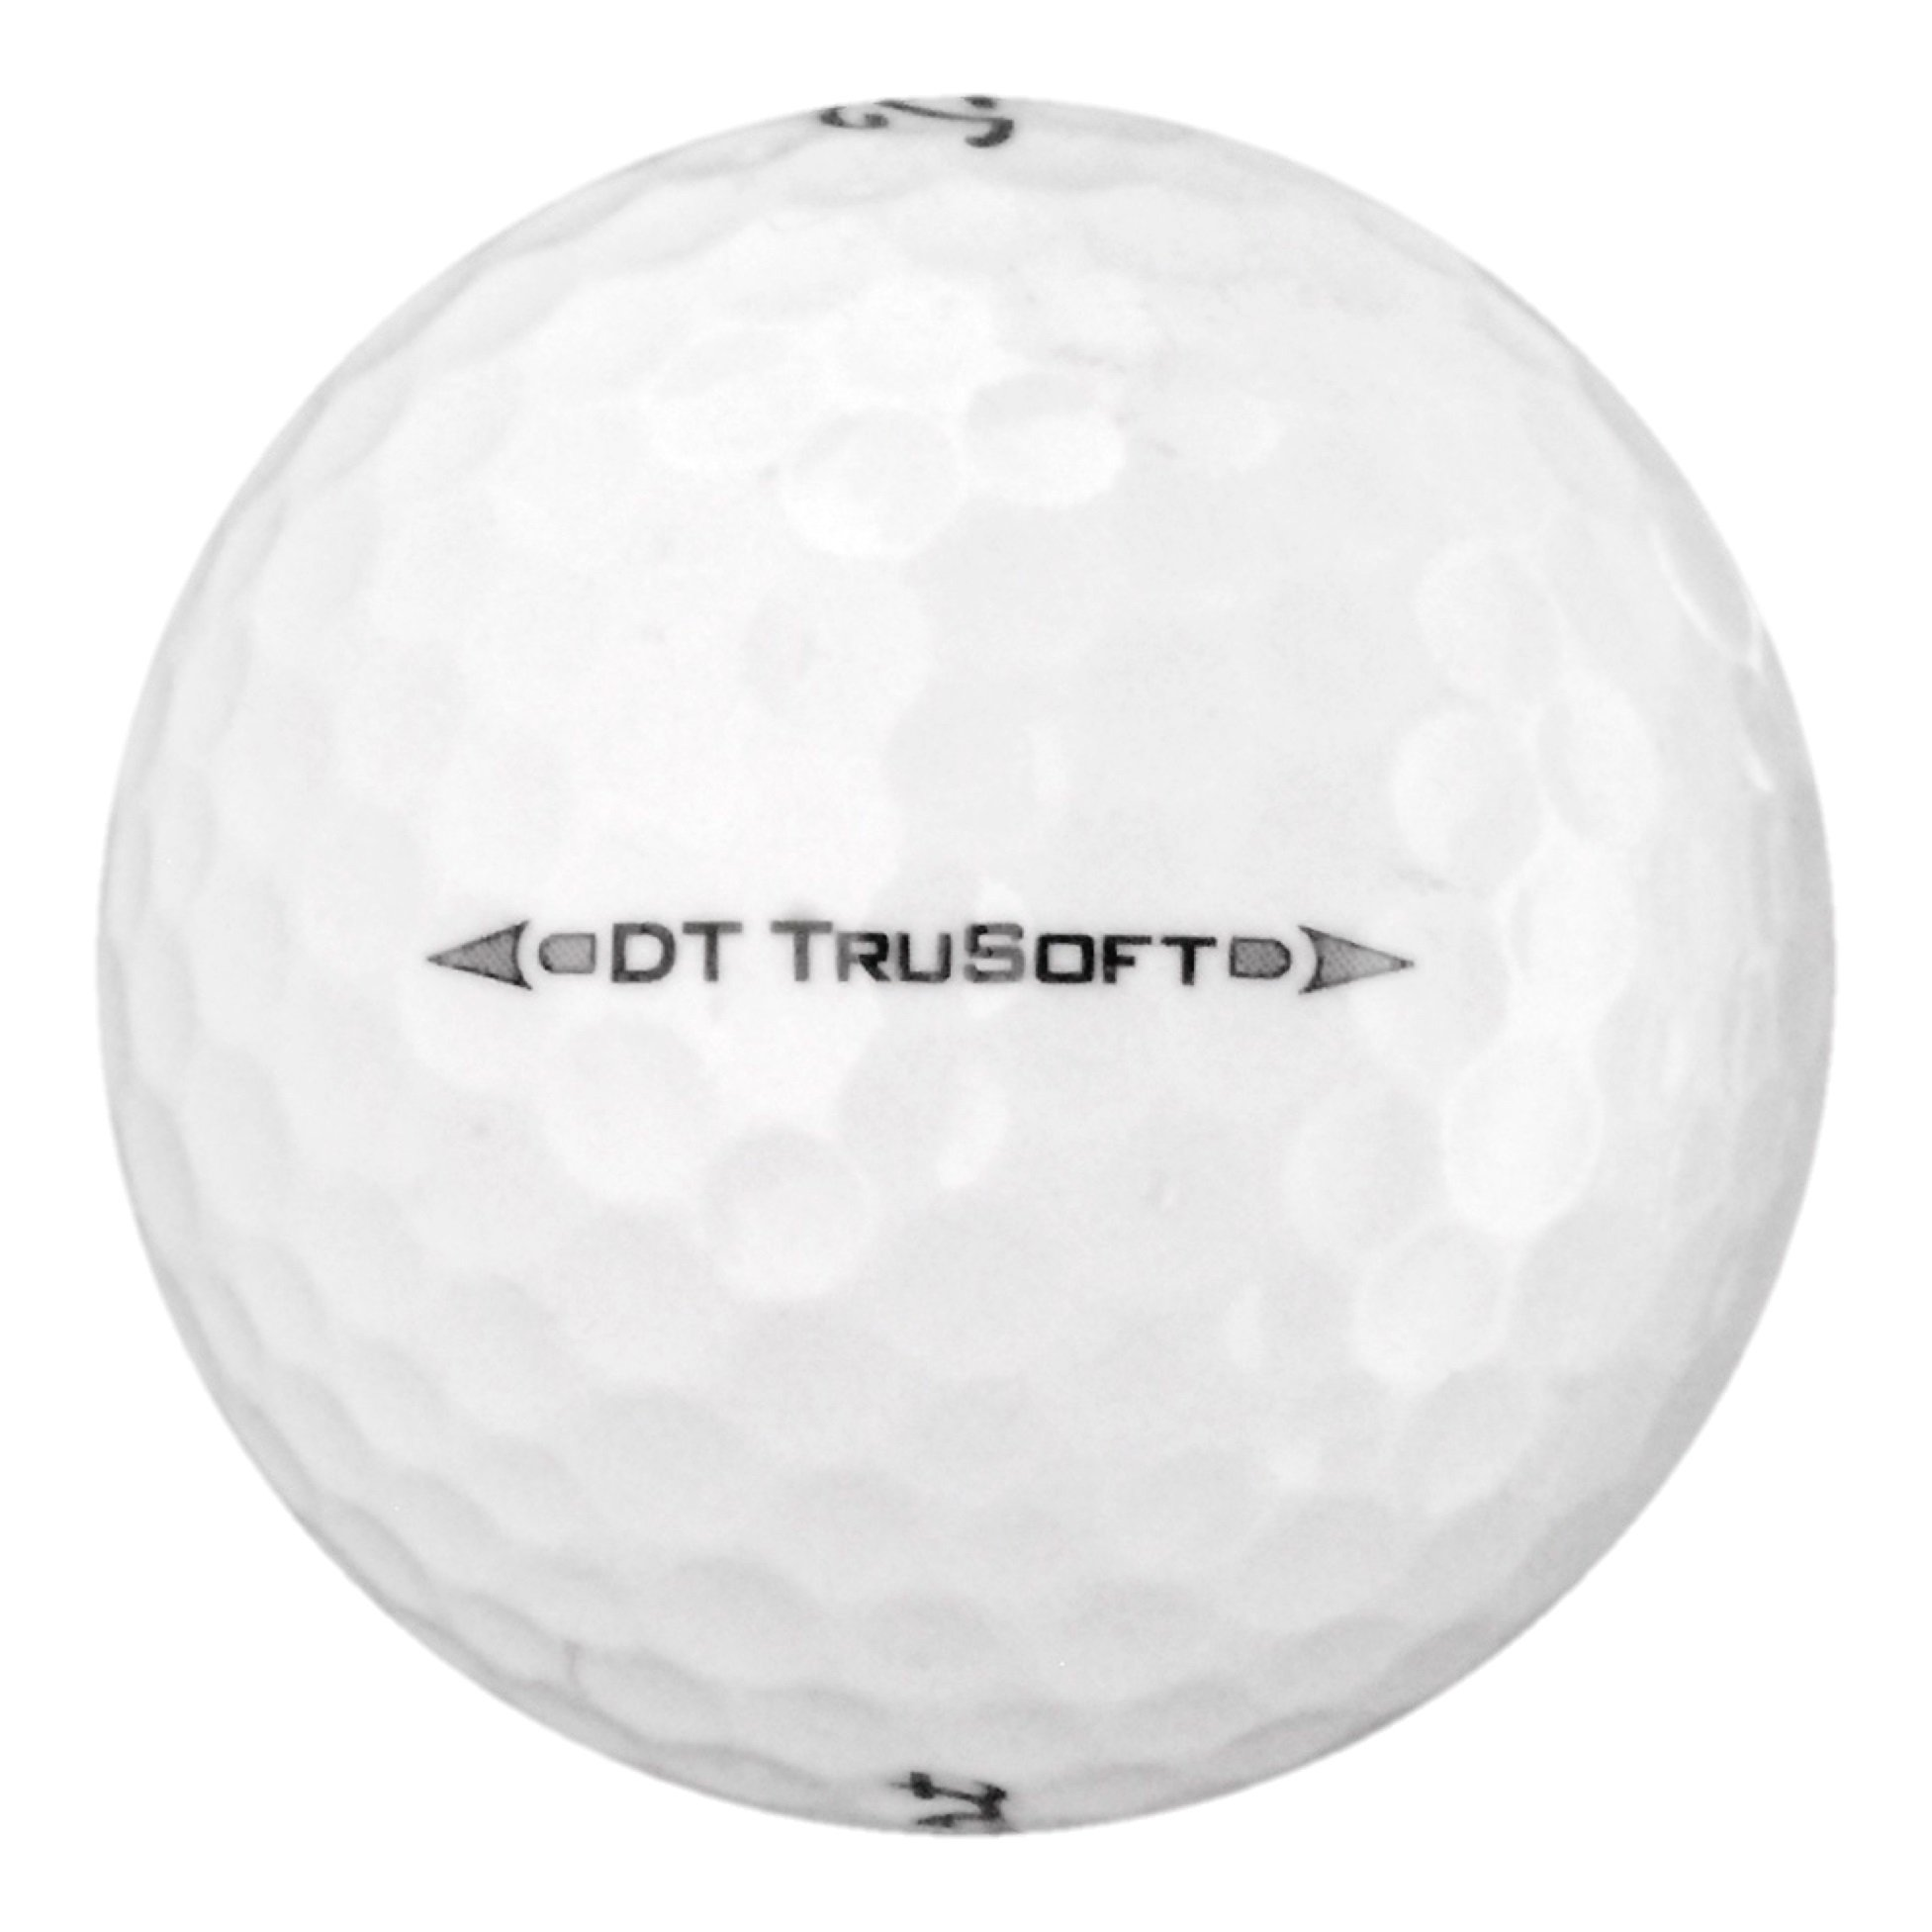 120 Titleist DT TruSoft - Near Mint (AAAA) Grade - Recycled (Used) Golf Balls